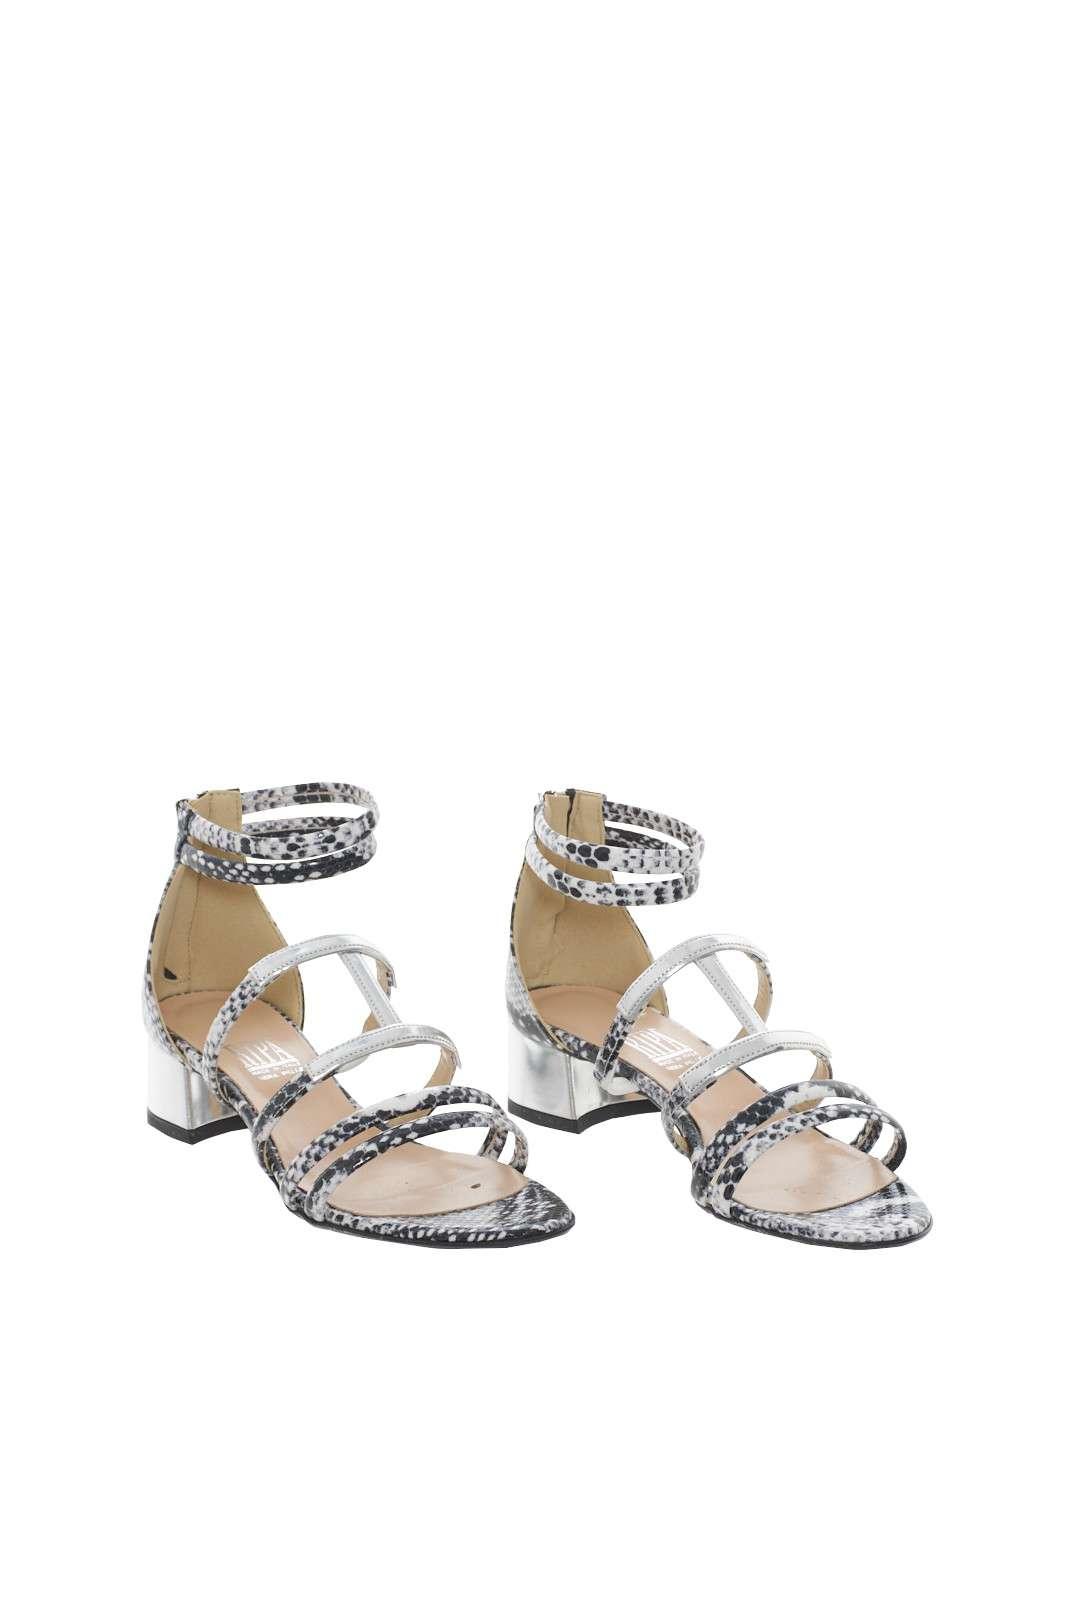 https://www.parmax.com/media/catalog/product/a/i/PE-outlet_parmax-sandali-donna-Ripa-Shoes-ripa-B.jpg